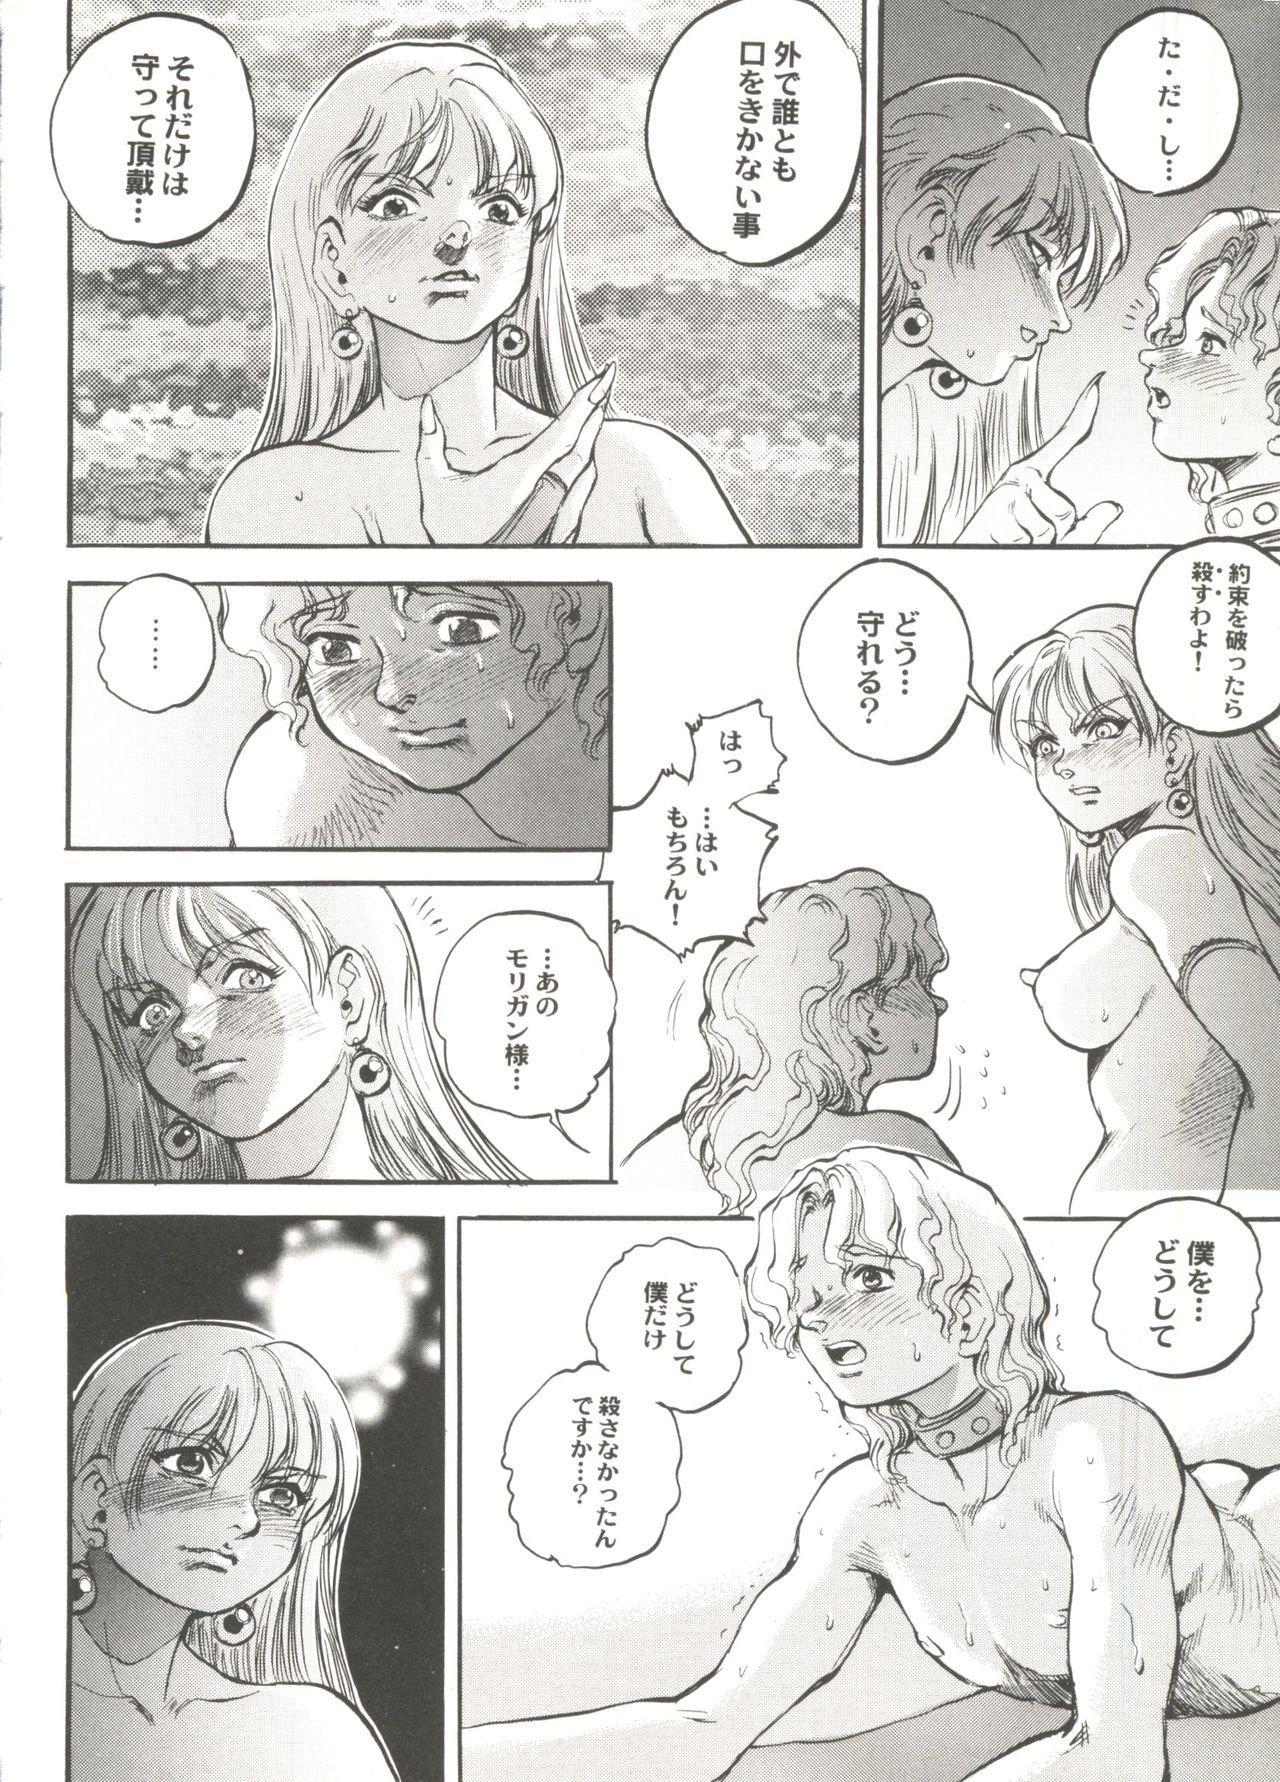 Bishoujo Doujin Peach Club - Pretty Gal's Fanzine Peach Club 9 135